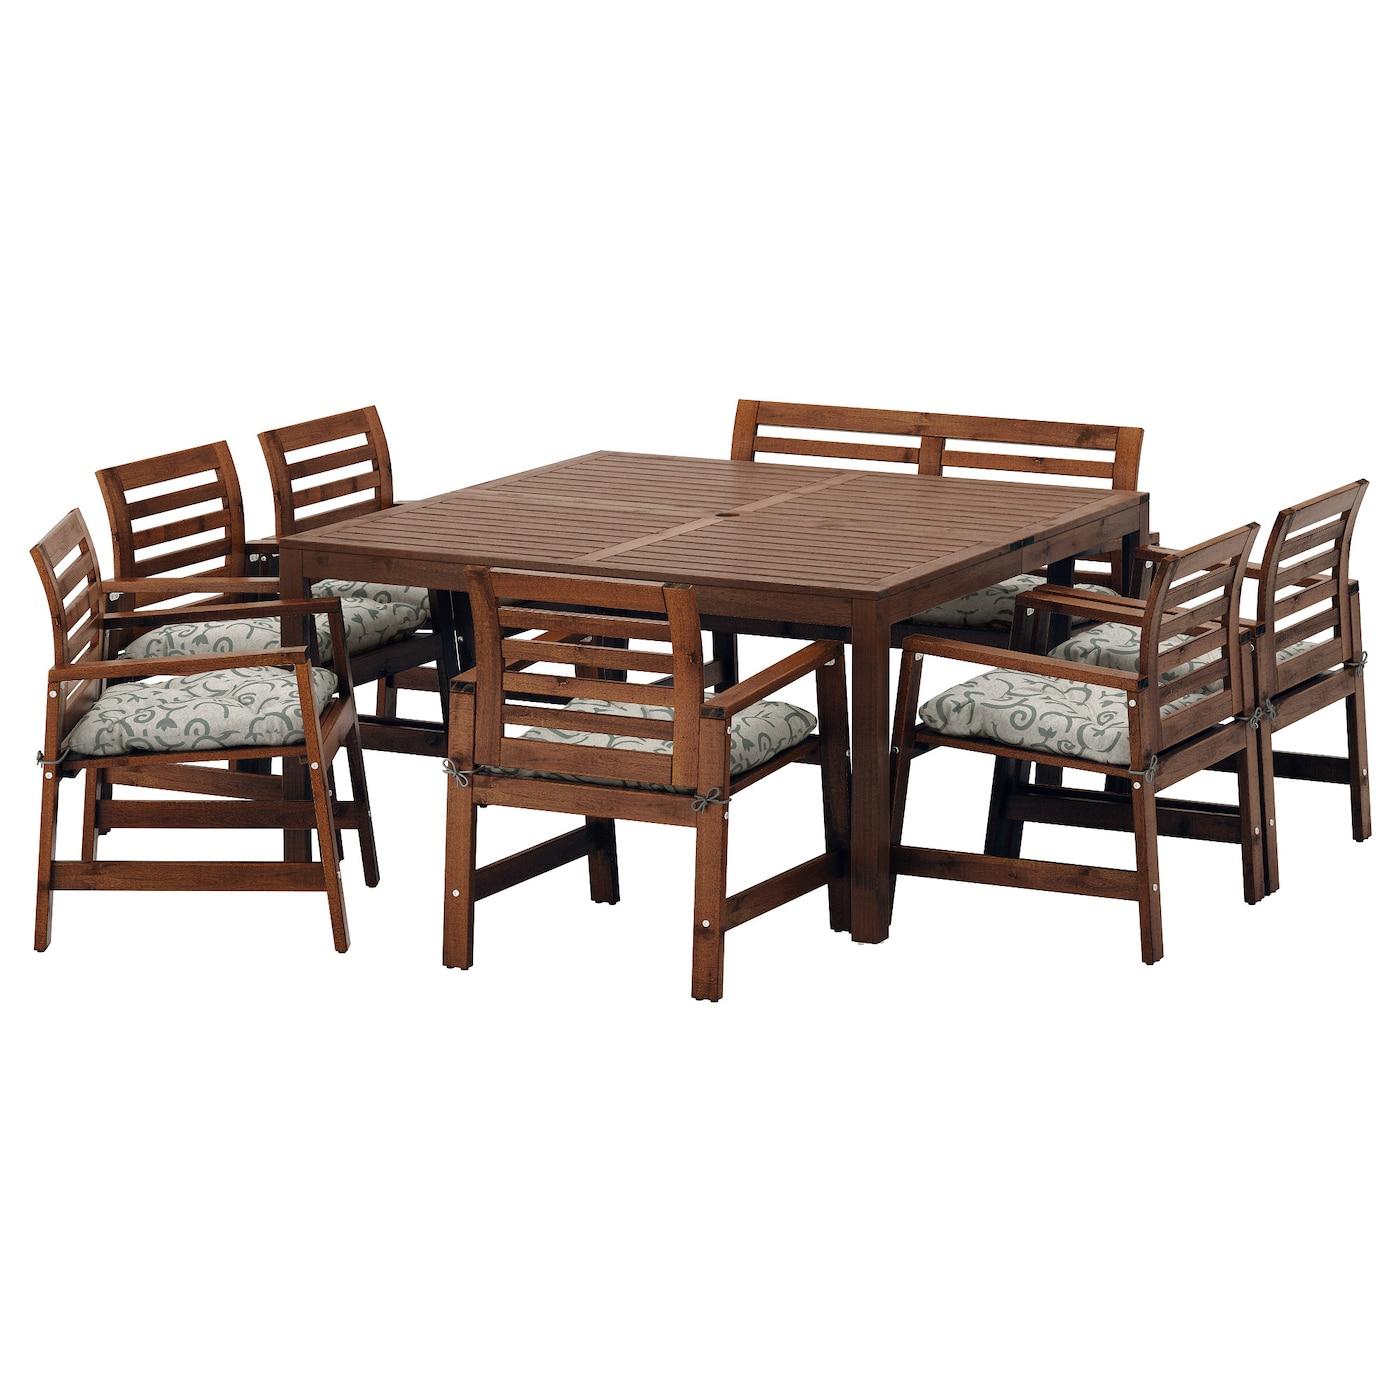 IKEA APPLARO Table 6 Chairs Armr Bench Outdoor